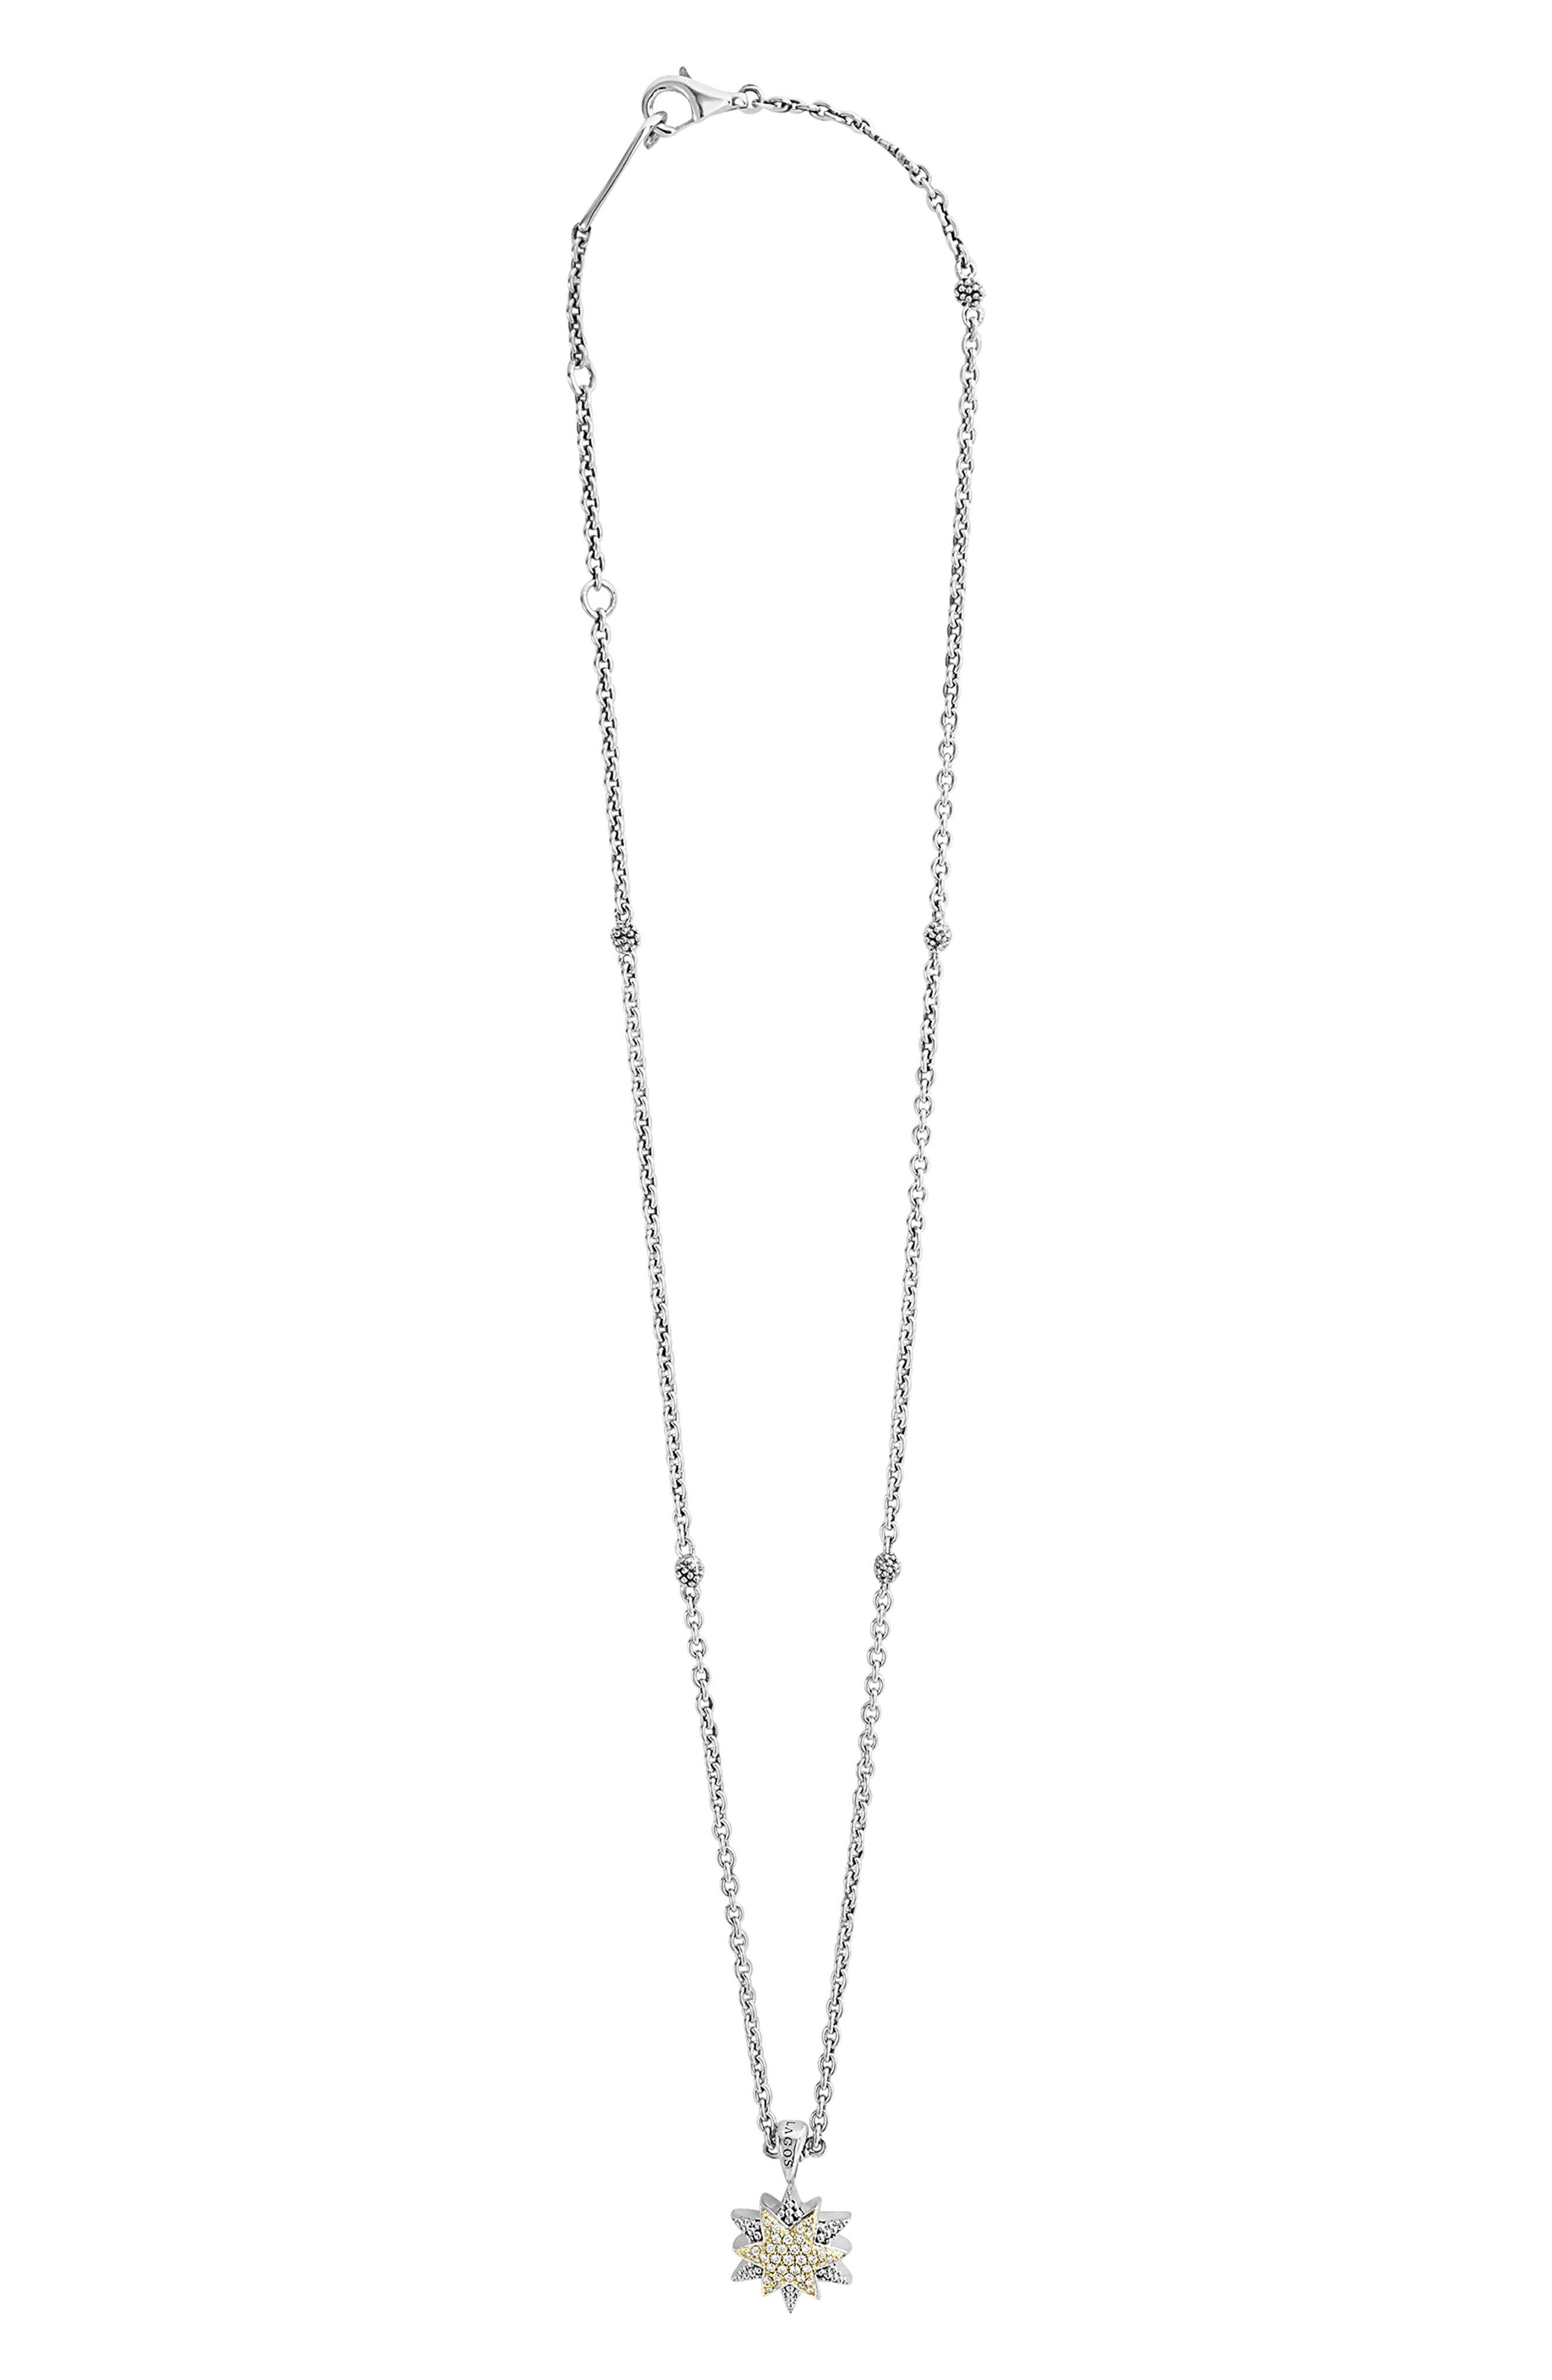 North Star Small Diamond Pendant Necklace,                             Main thumbnail 1, color,                             DIAMOND